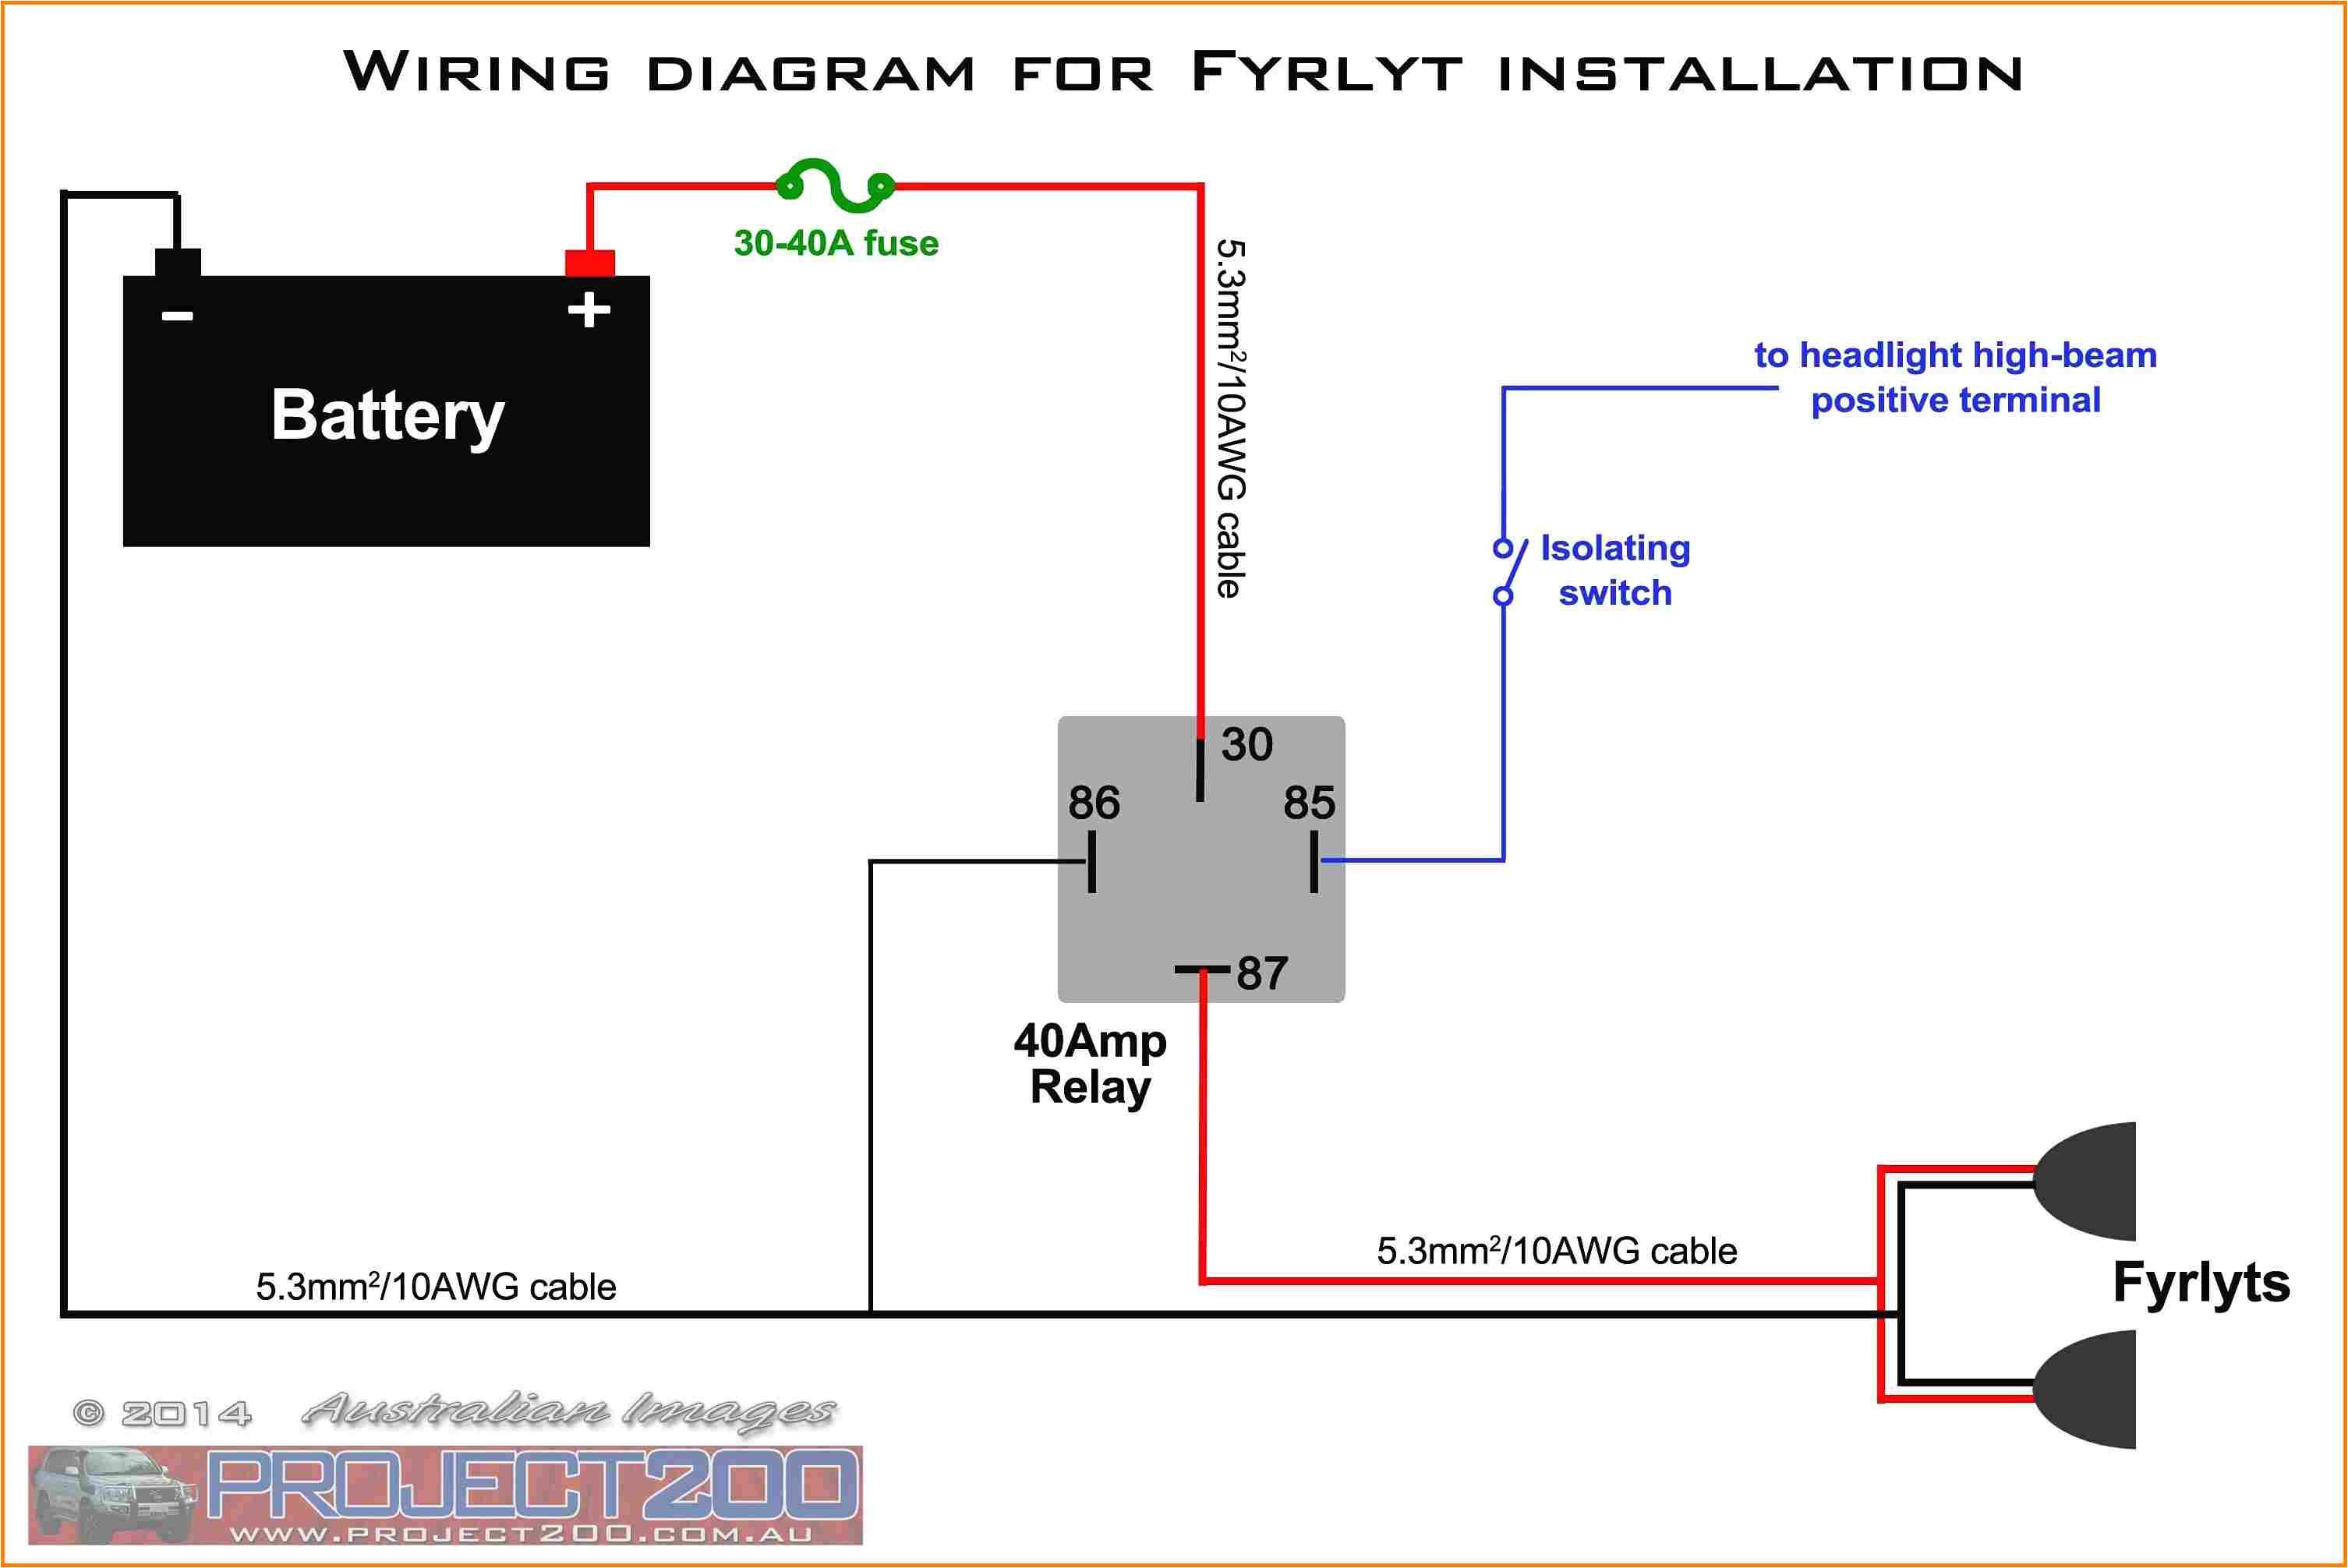 4 wire relay schematic wiring diagram page 4 wire relay diagram wiring diagram image 4 pin